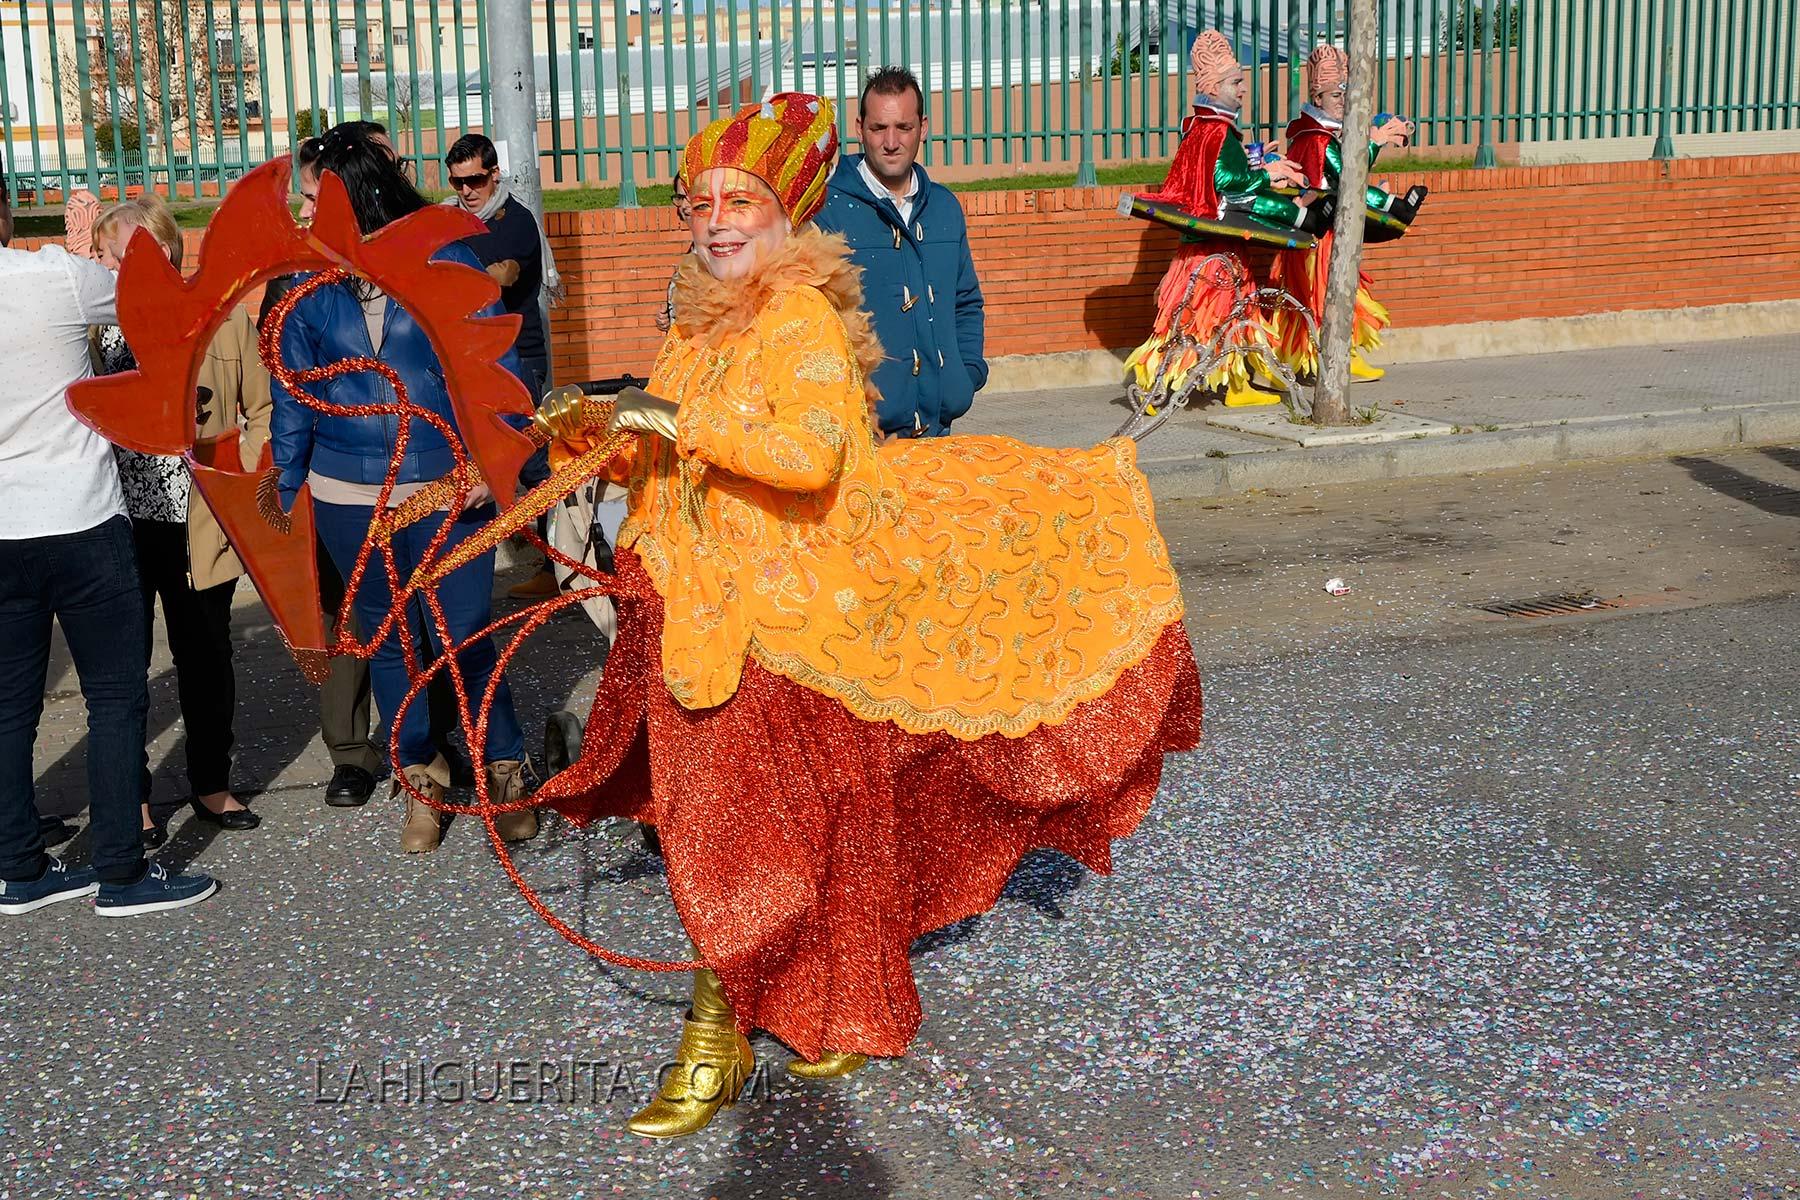 cabalgata carnaval isla cristina _DSC0278